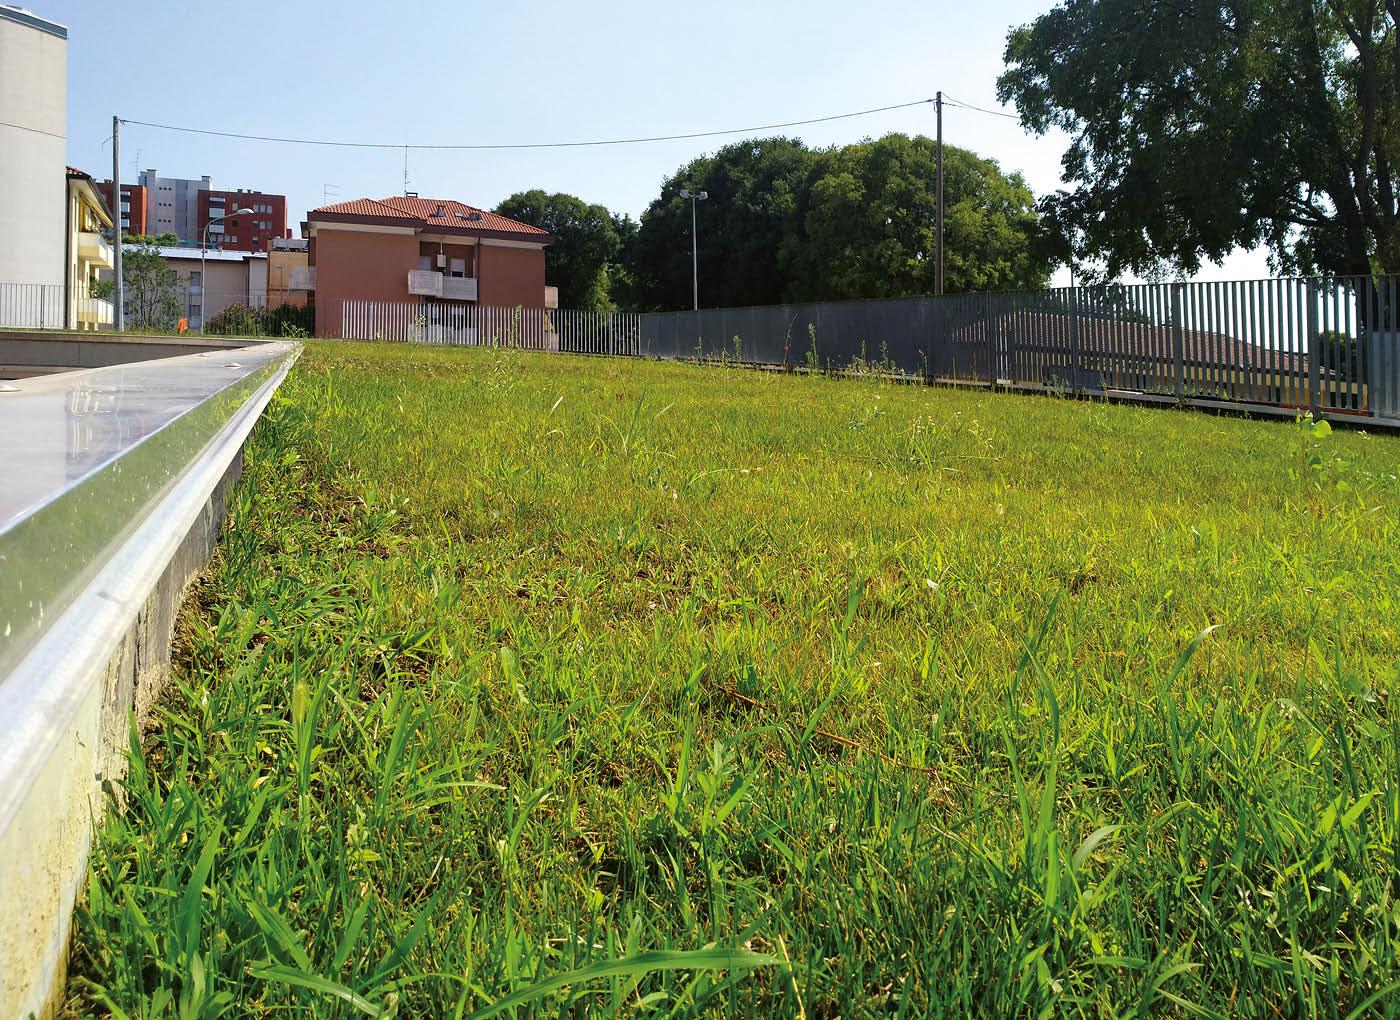 ospedale-pordenone-tetto-verde-lecagreen-1